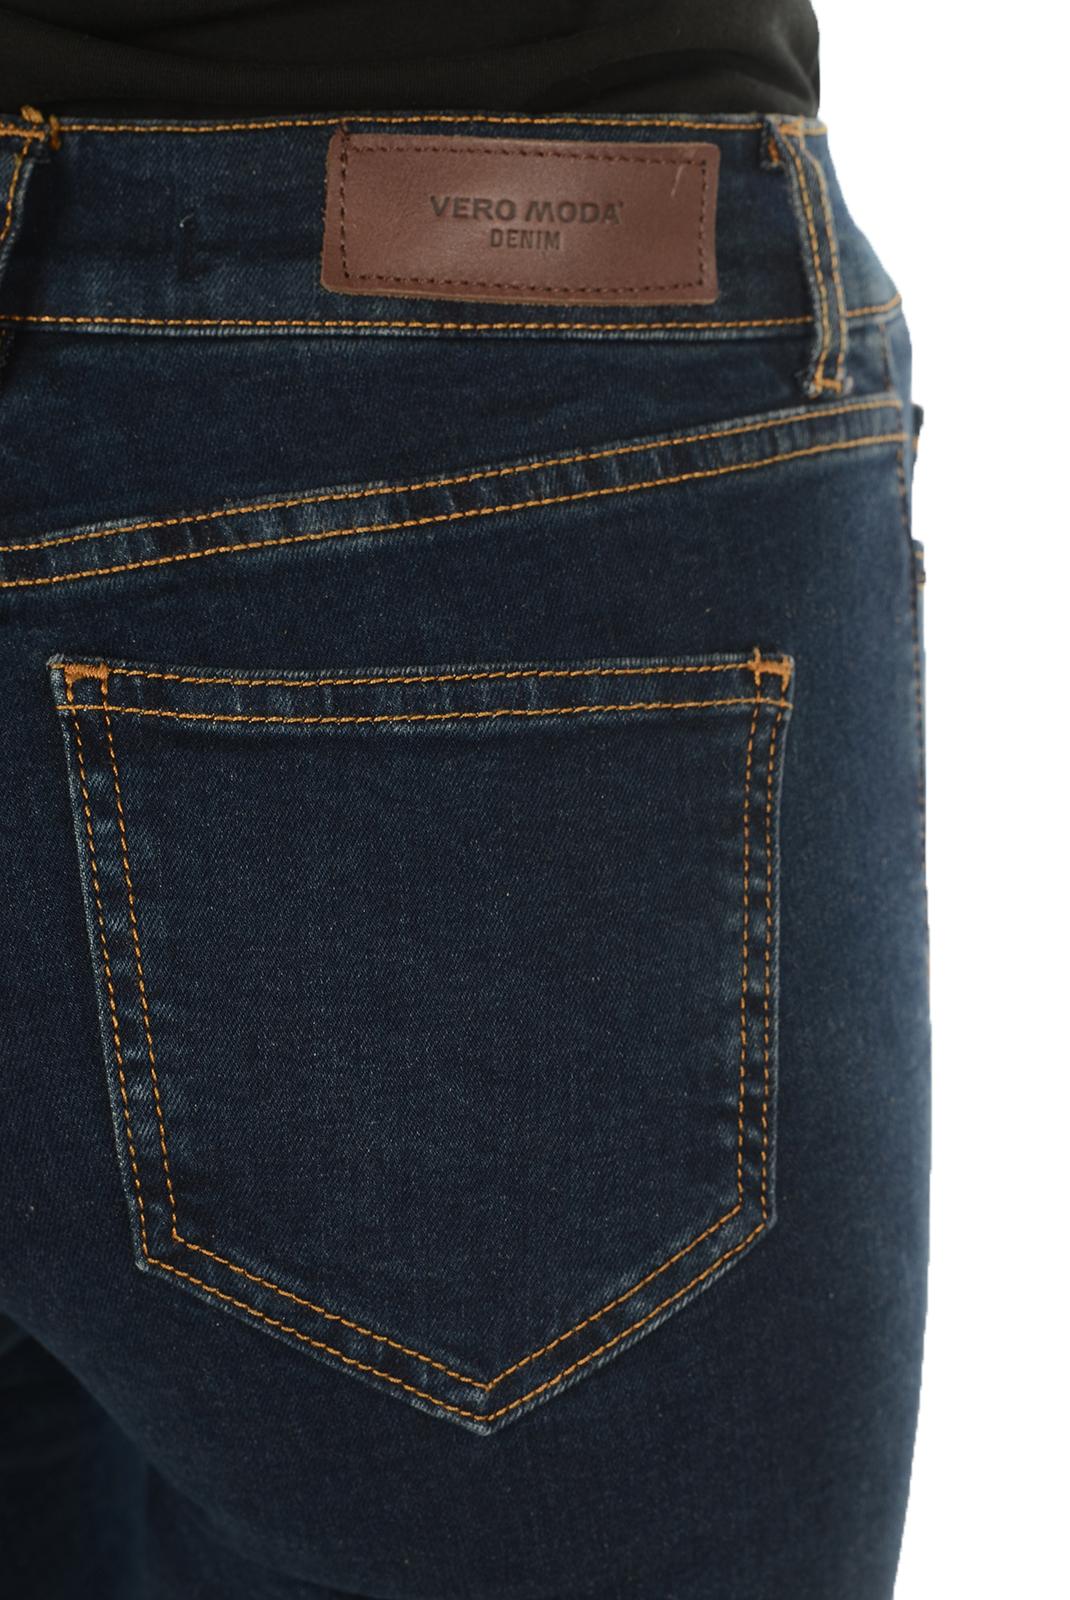 Jeans   Vero moda FIFTEEN STRAIGHT NW BA023 NOOS DENIM